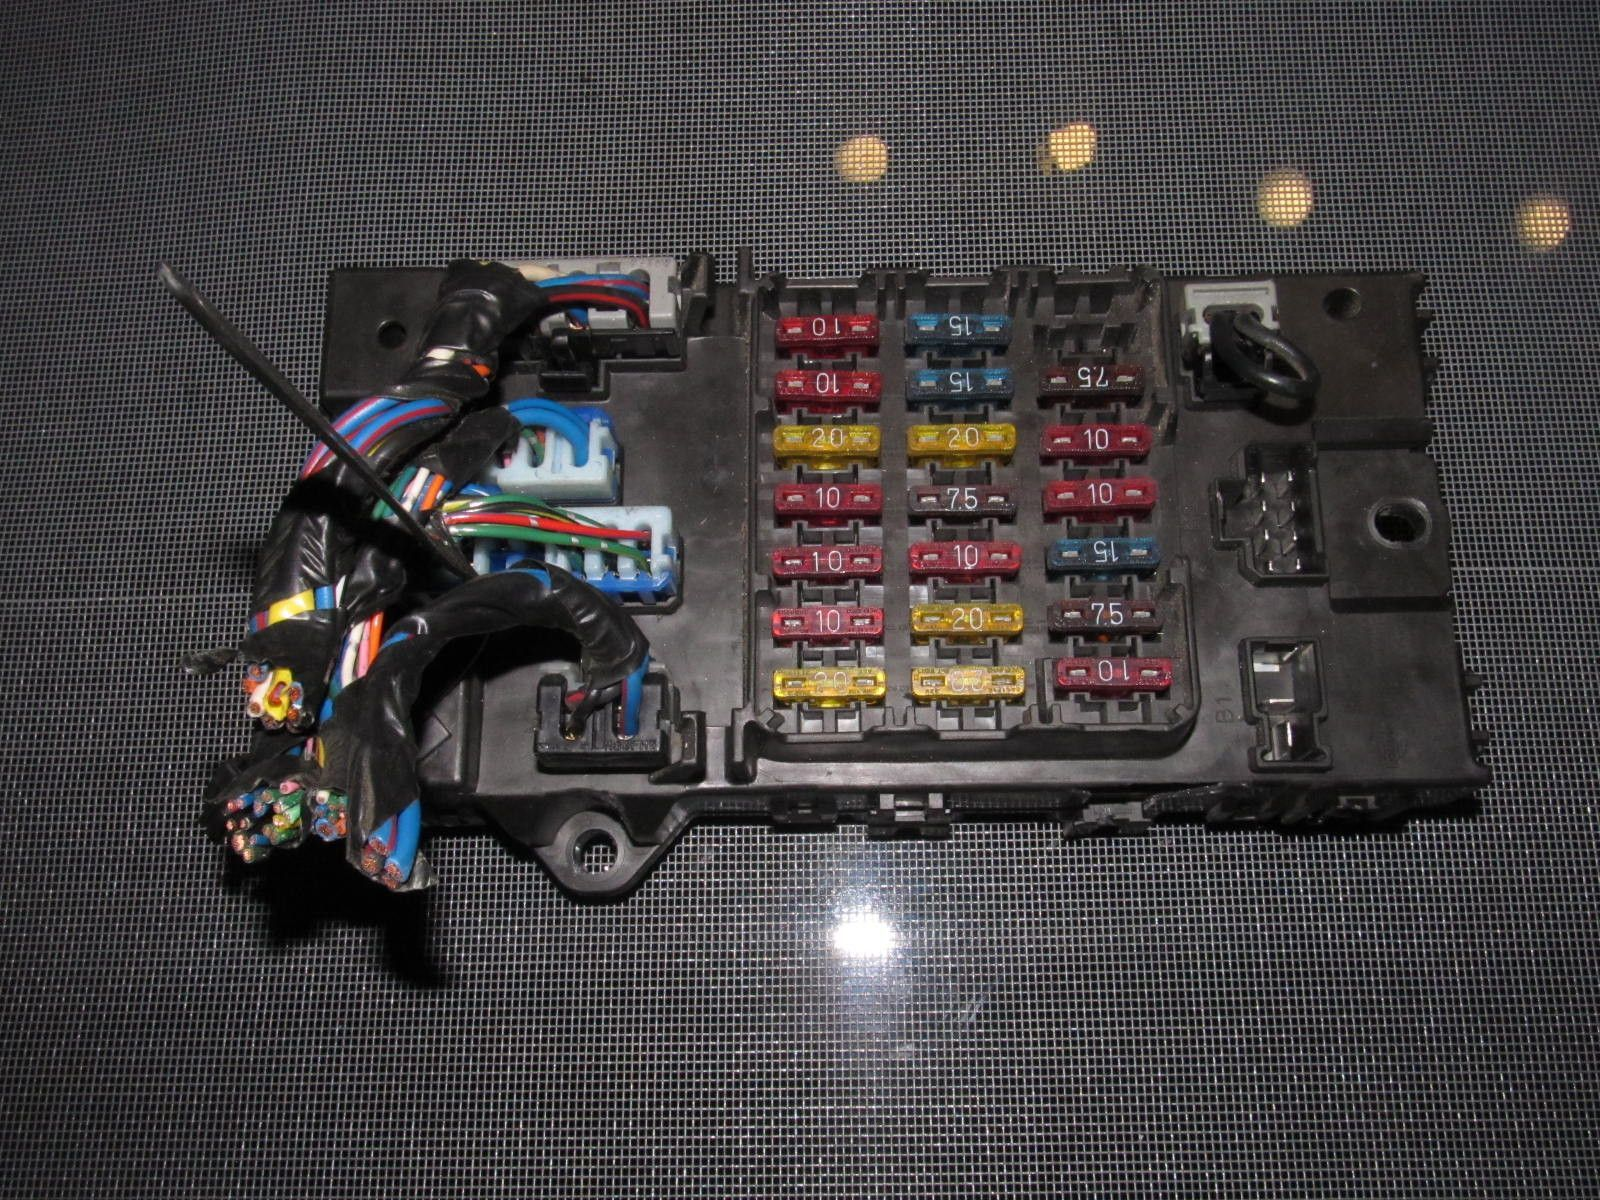 nissan 300zx fuse box wiring diagram database90 96 nissan 300zx oem interior fuse box autopartone com [ 1600 x 1200 Pixel ]